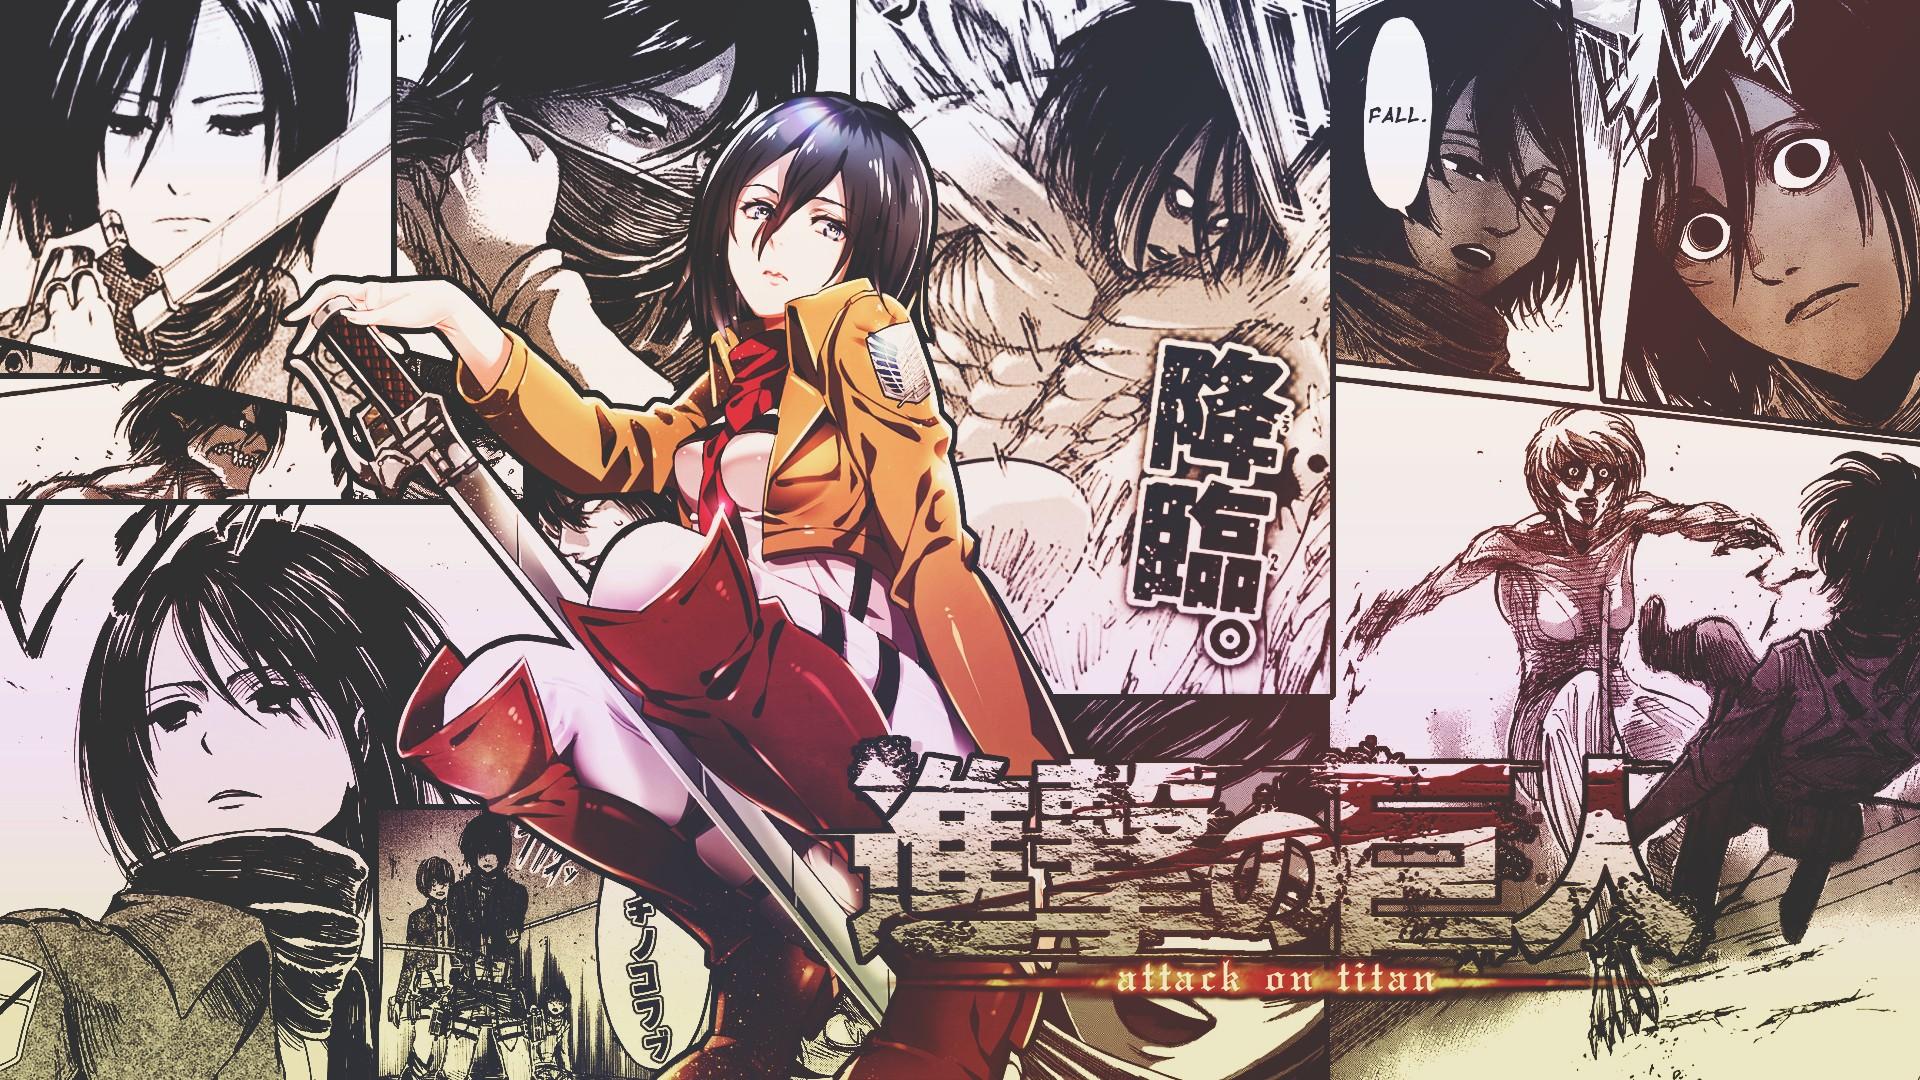 Wallpaper Illustration Anime Girls Manga Cartoon